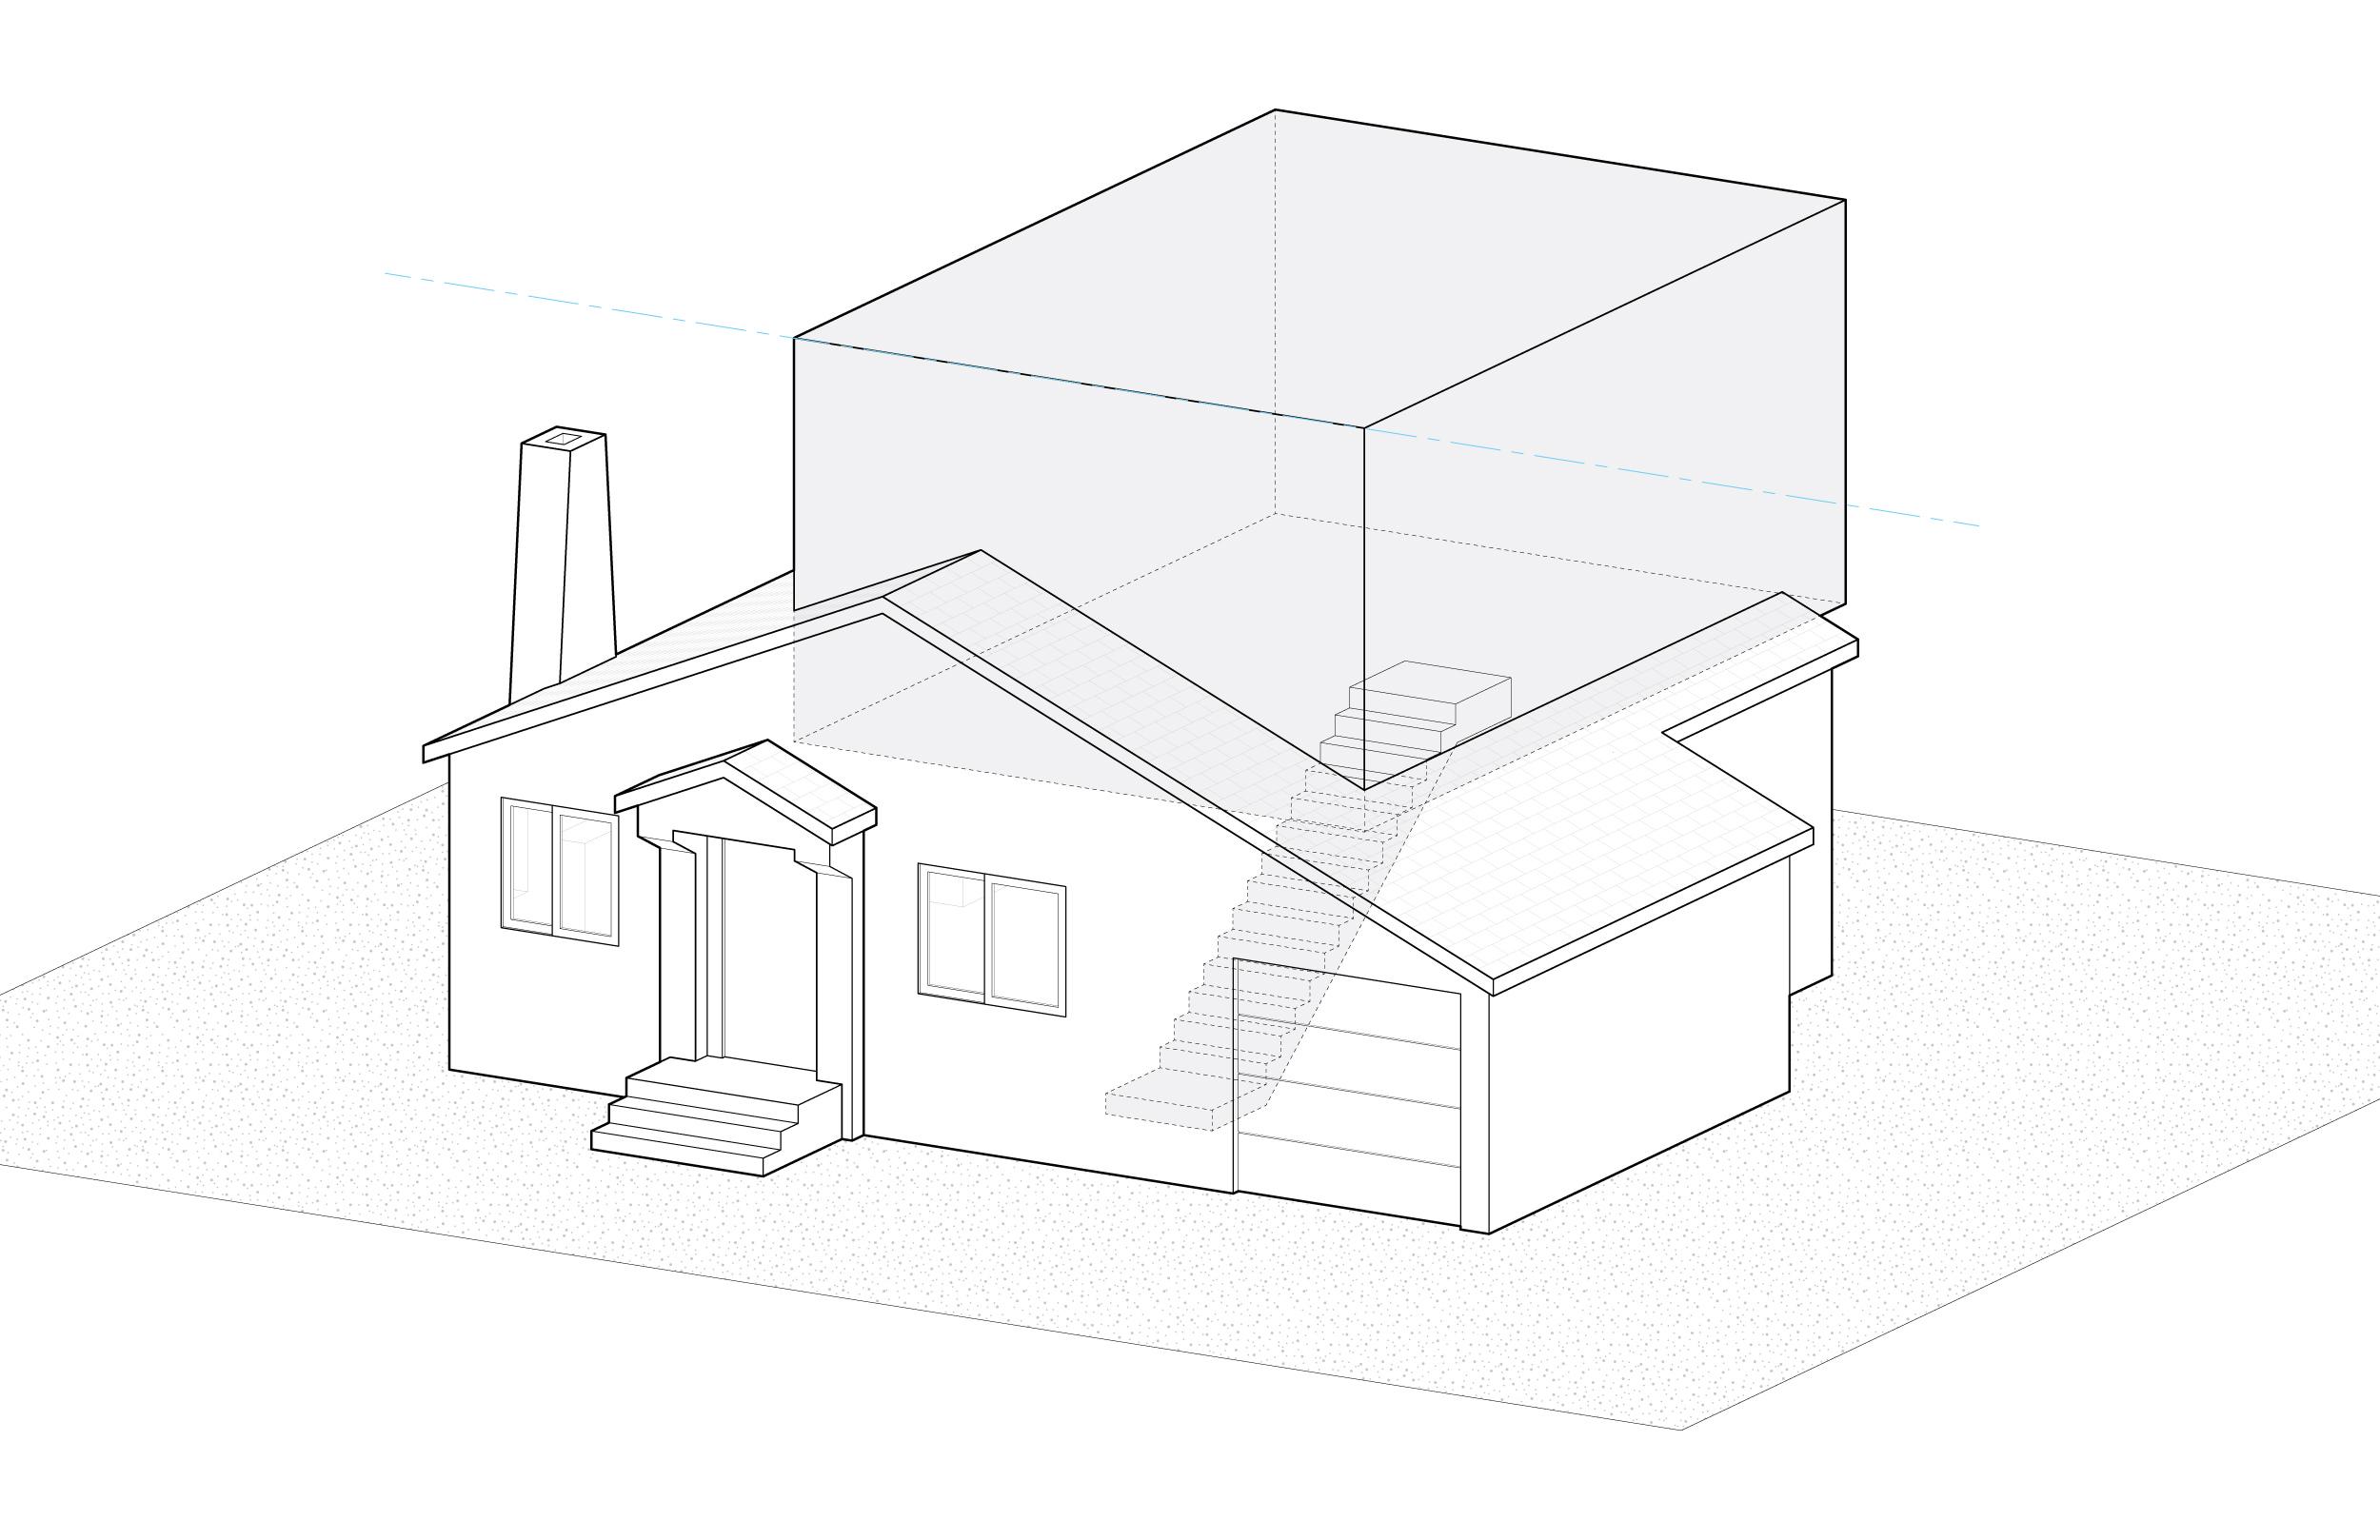 Rosewood-House_Diagram_03.jpg